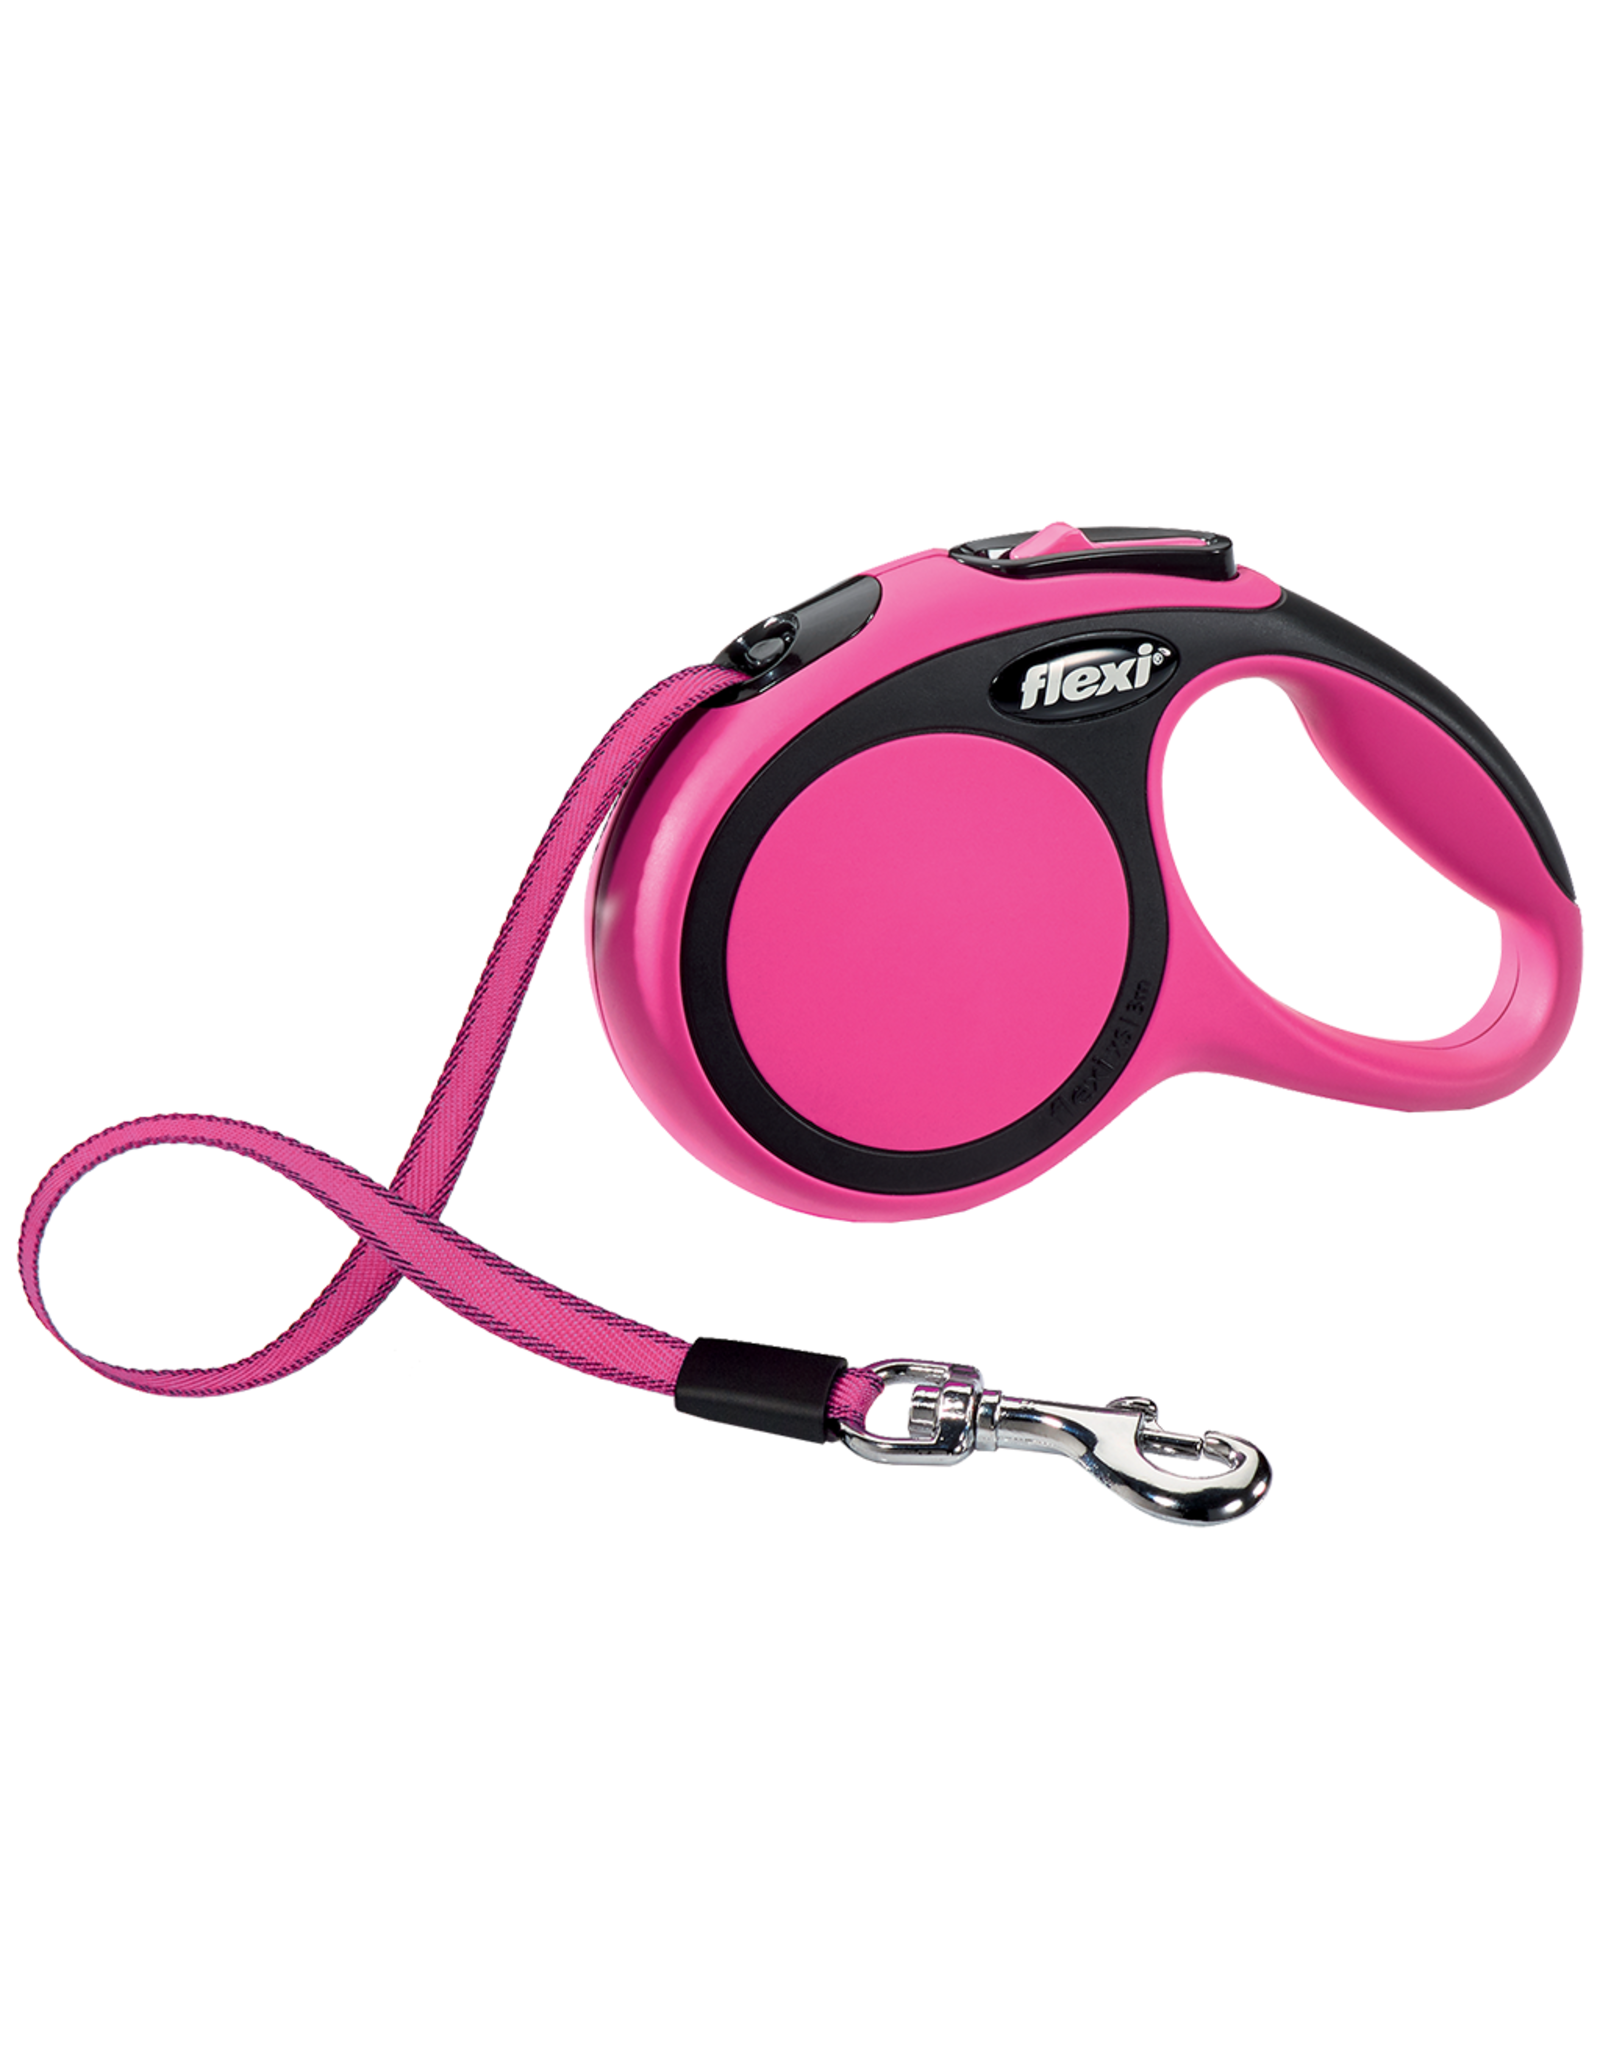 Flexi Flexi - Tape Leash - Pink